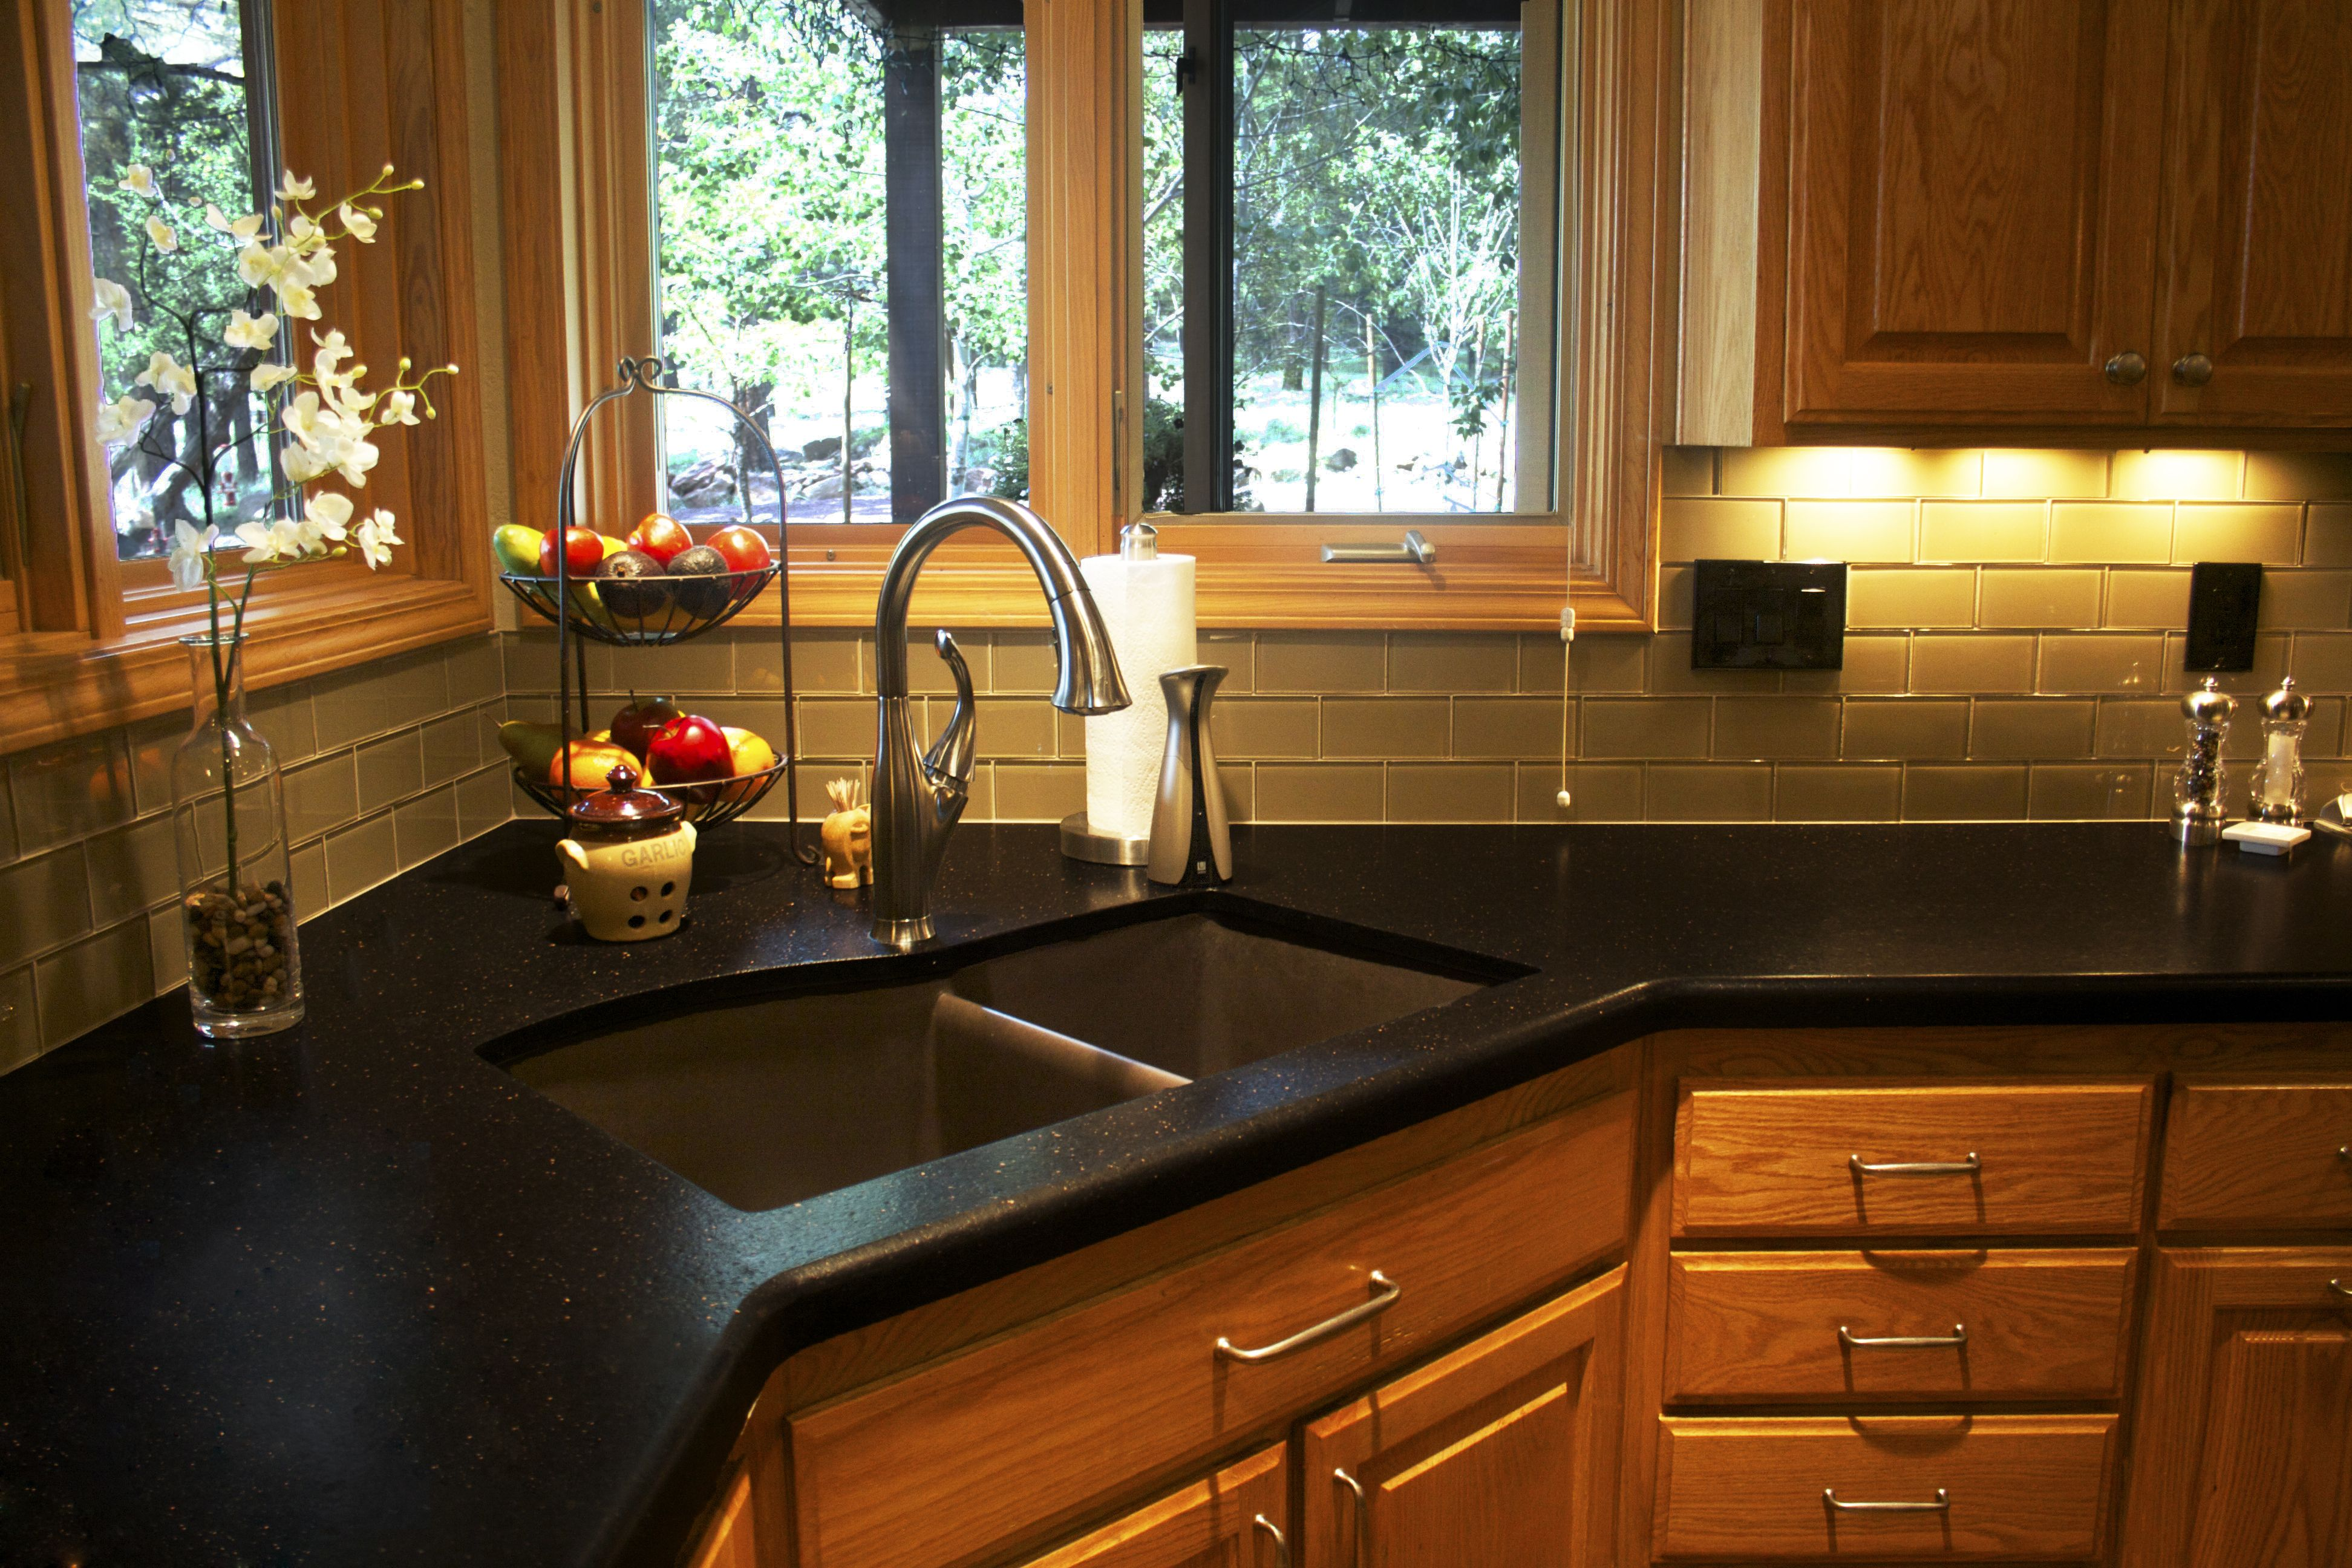 black galaxy granite with 1 1 2 top bullnose black countertops kitchen kitchen cabinets on kitchen decor black countertop id=18976